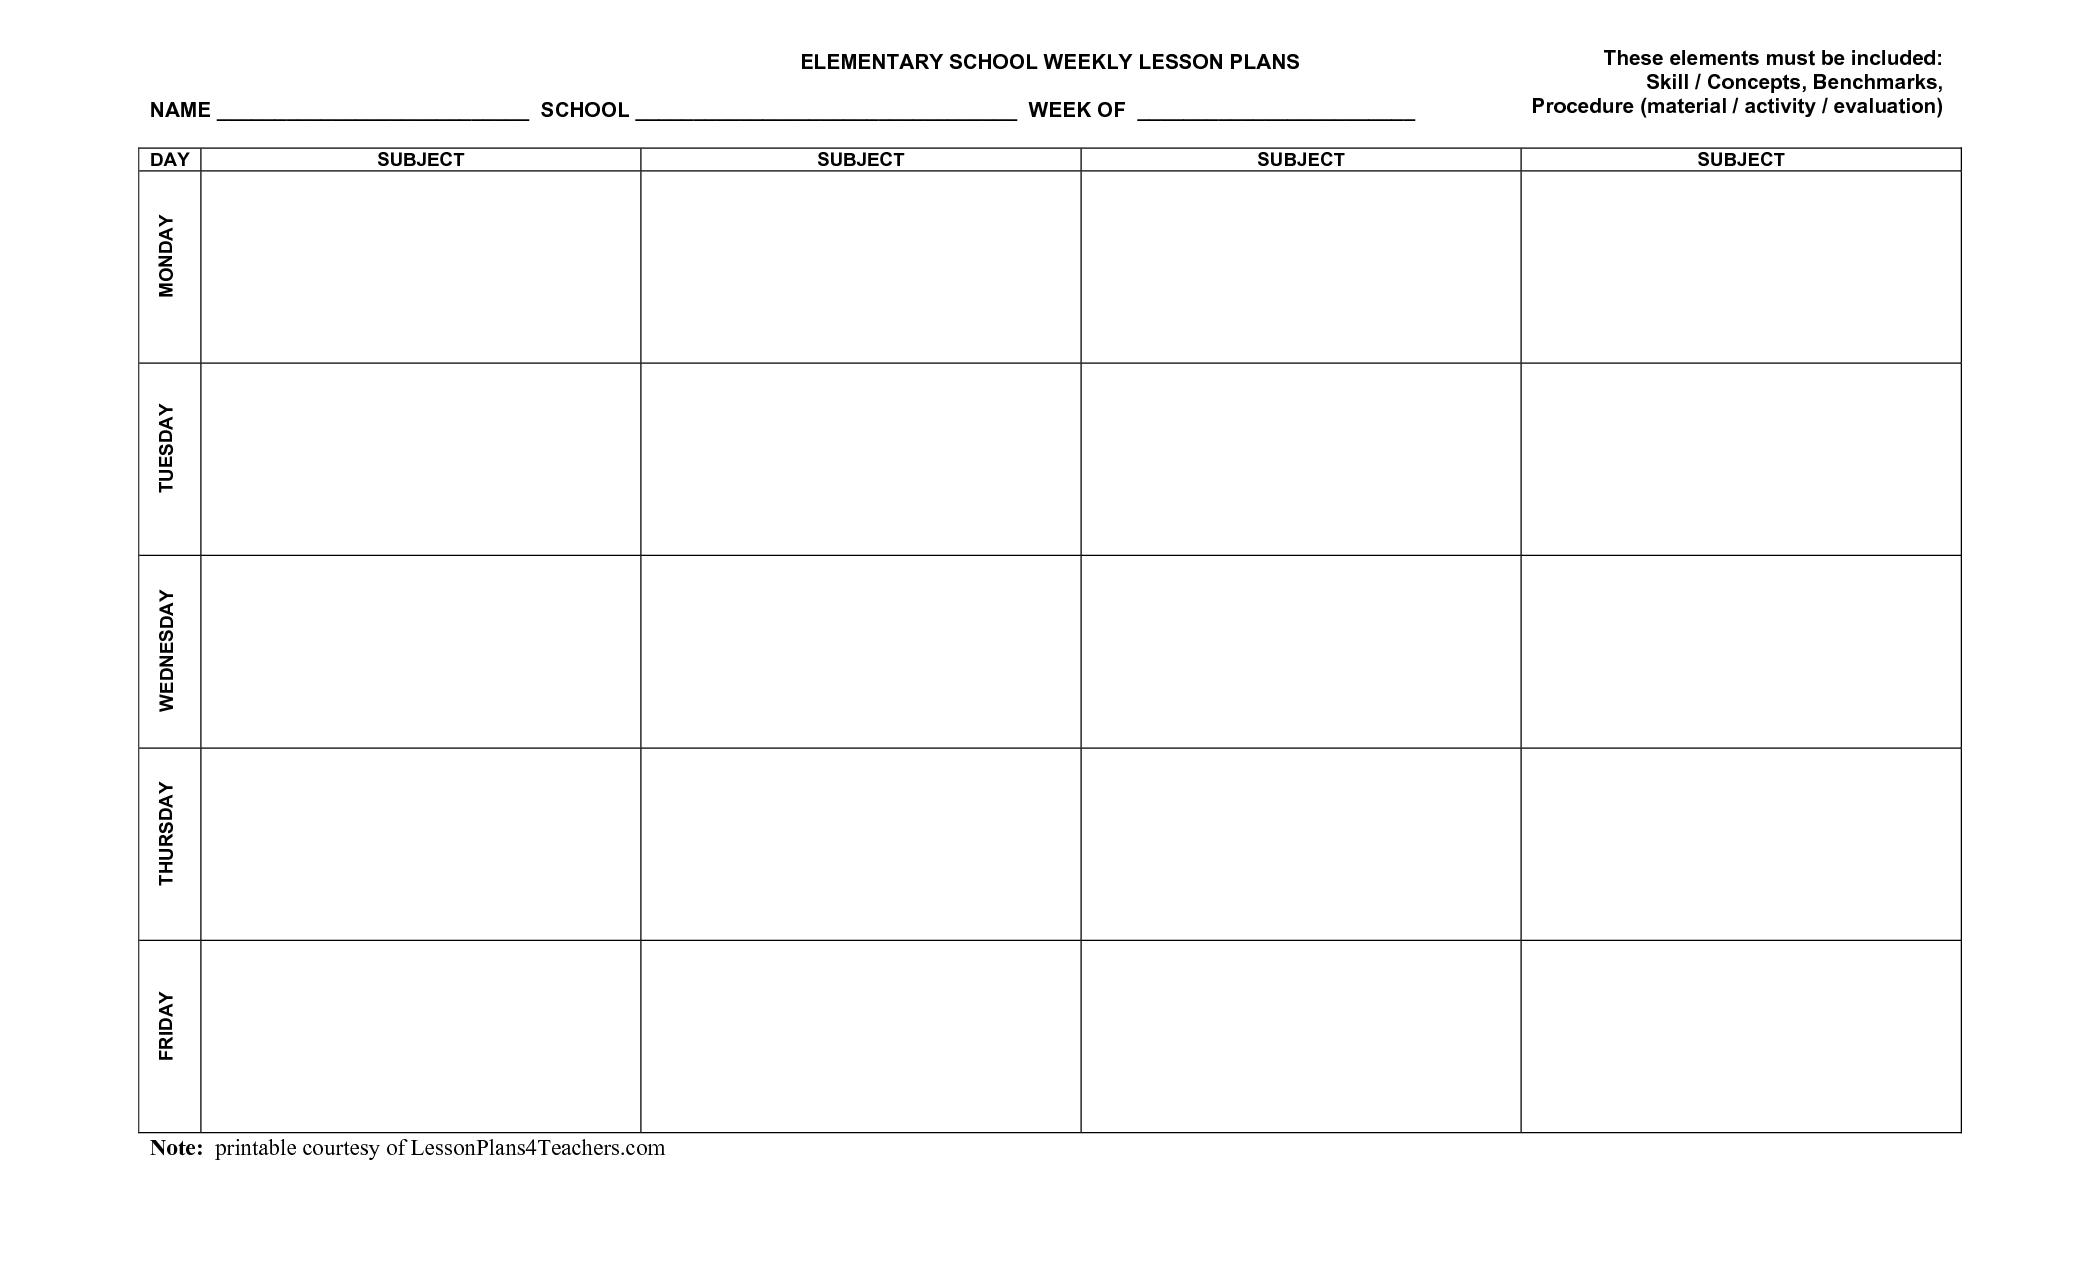 Free Lesson Plan Printable Calendar | Template Calendar Printable with Free Lesson Plan Printable Calendar